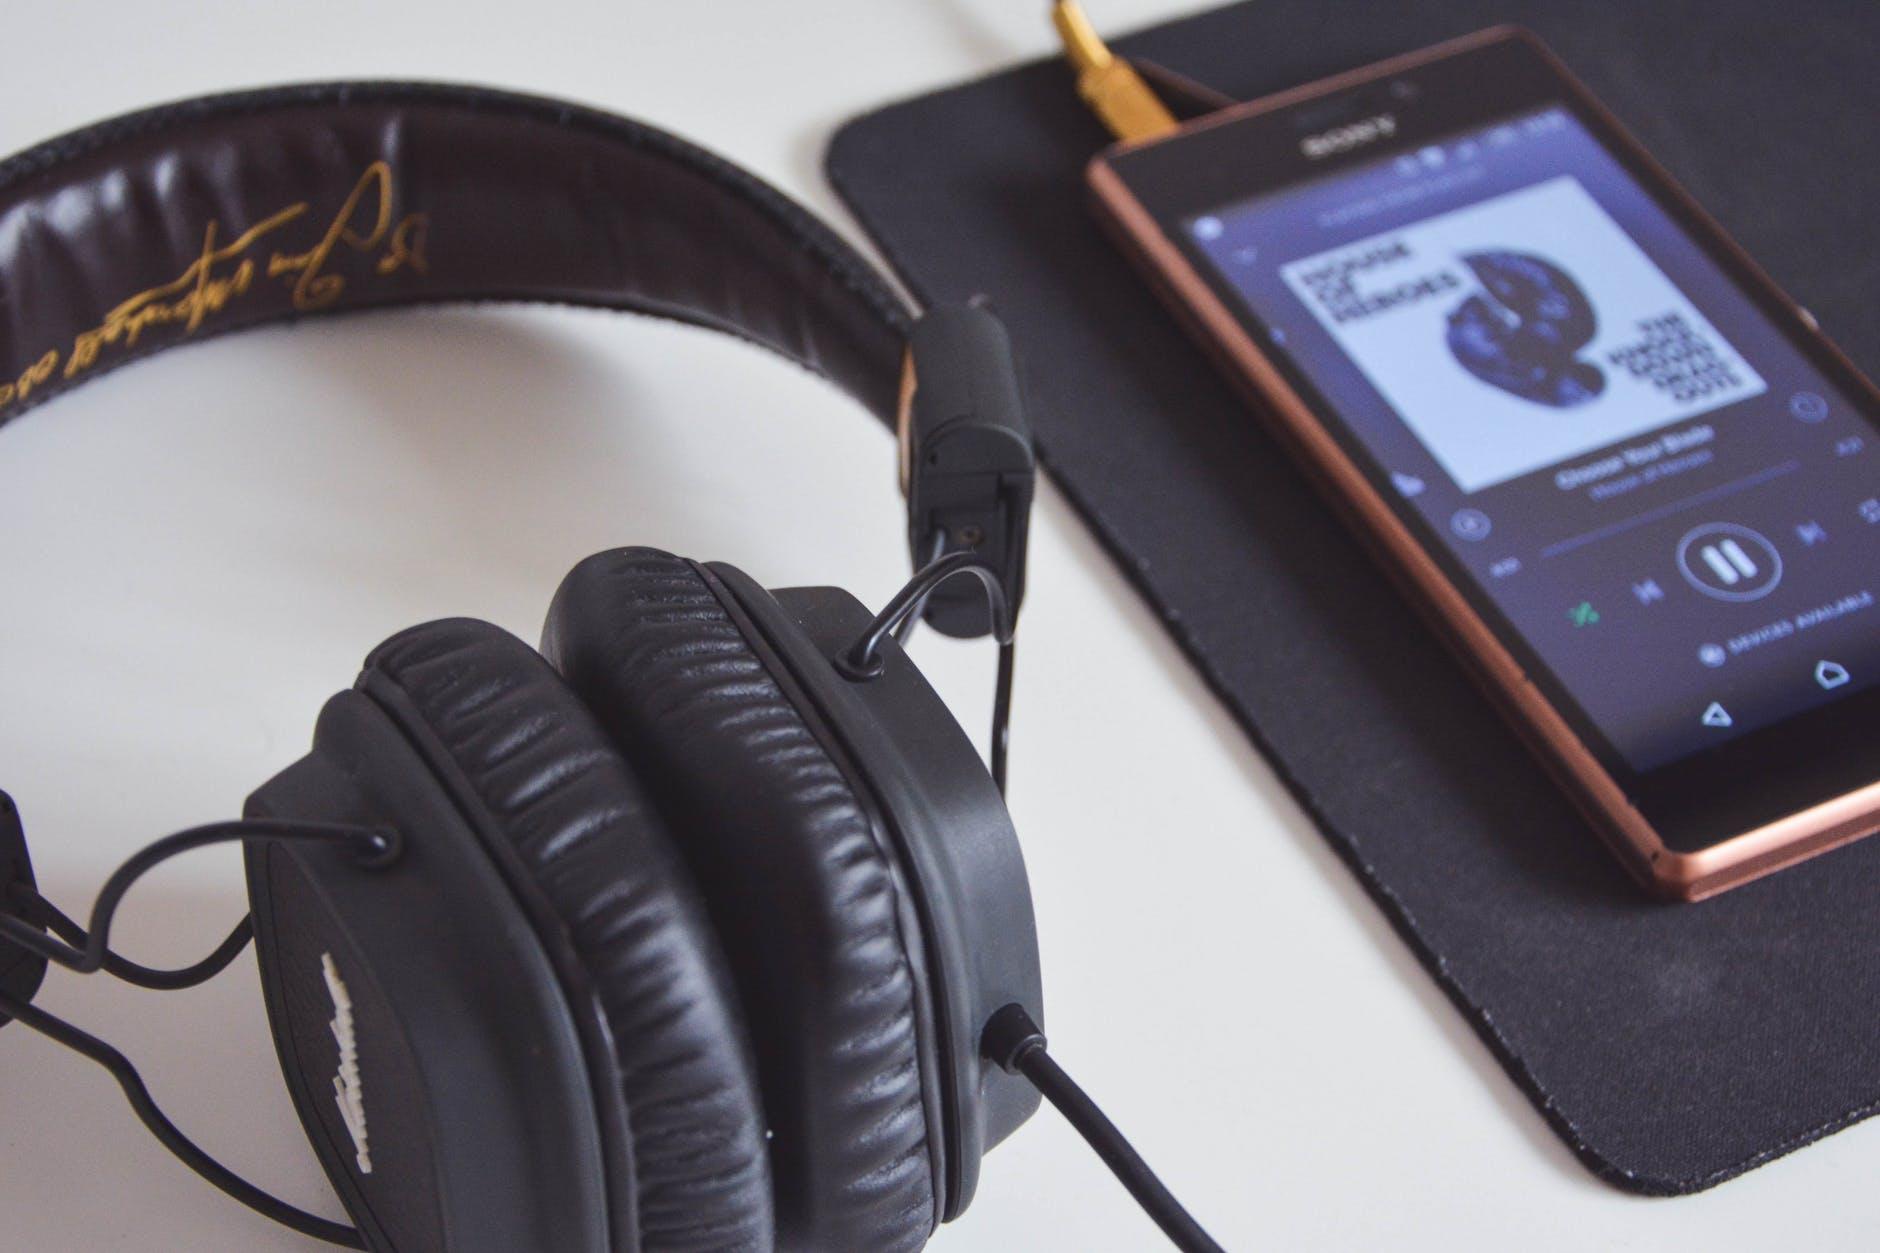 Headphones with smartphone playing Binaural Beats Music